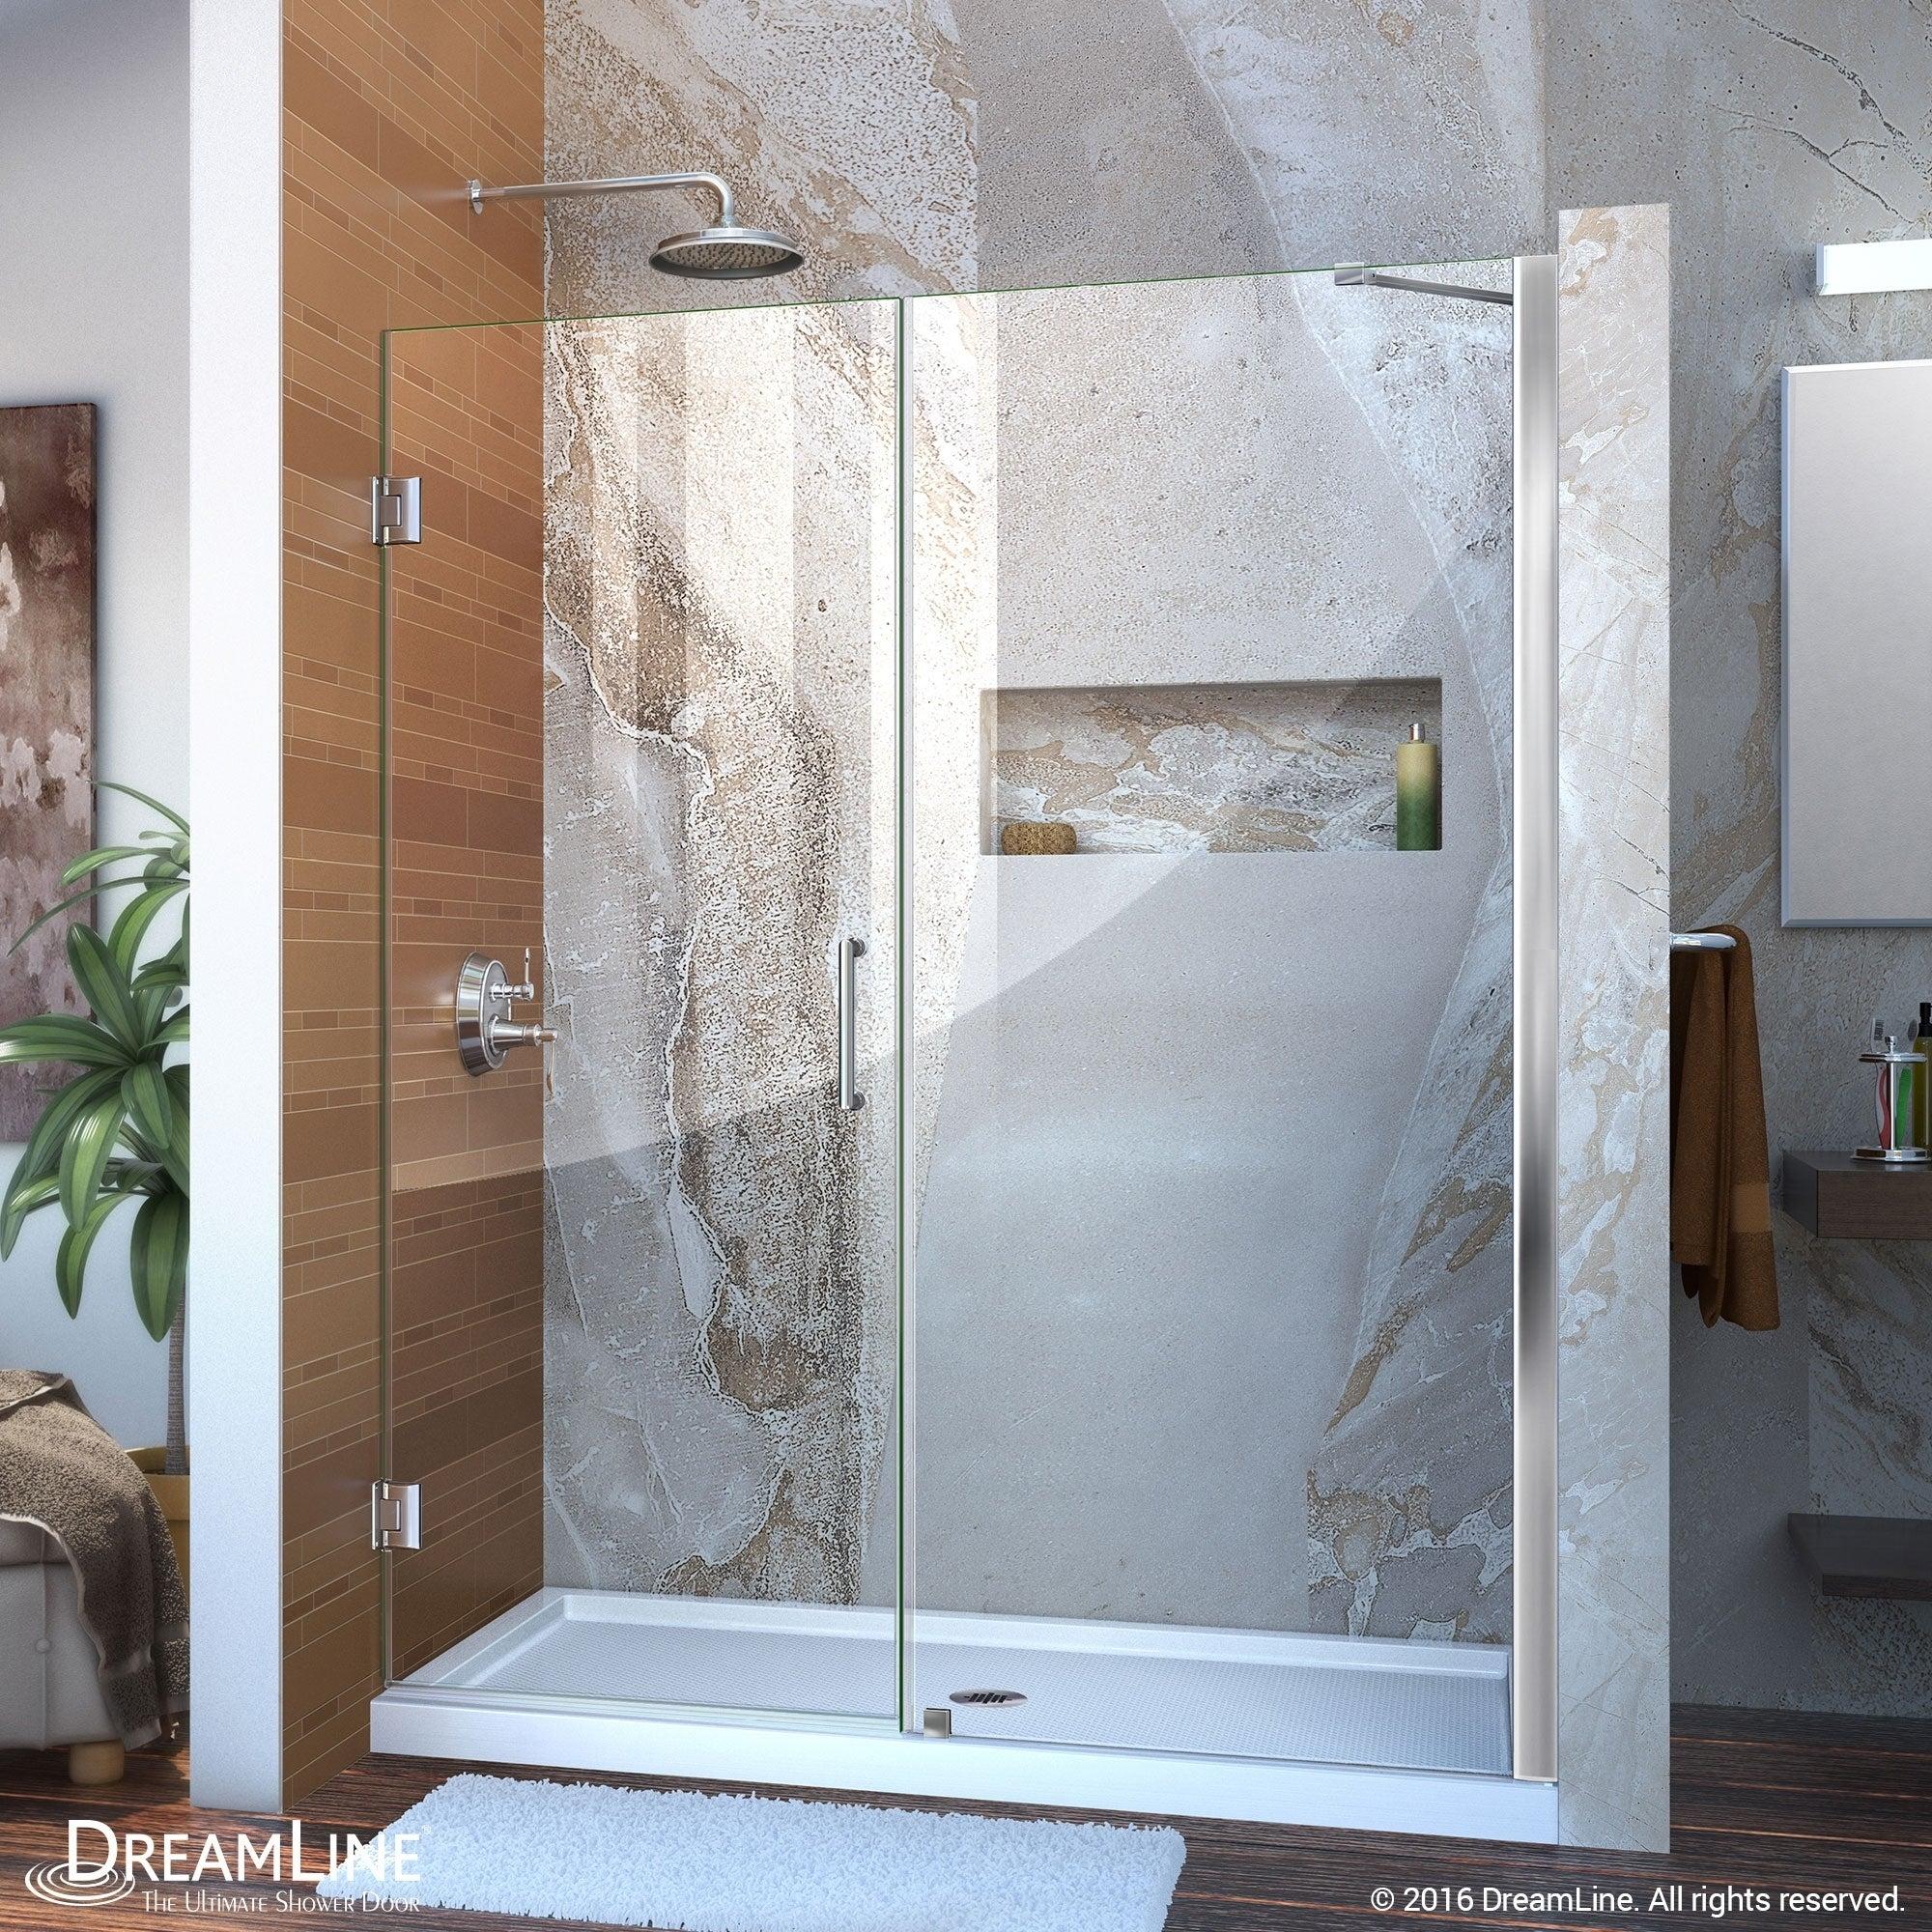 DreamLine Unidoor 57-58 in. W x 72 in. H Hinged Shower Door with Support Arm - 57 - 58 W (Brushed Nickel Finish)